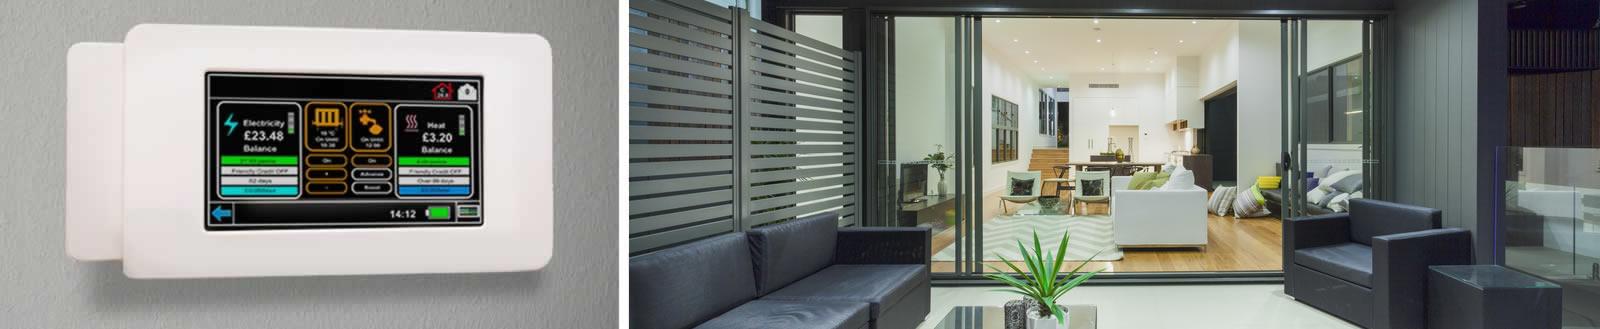 HeatPlus™ Home Energy Controller HEC 3